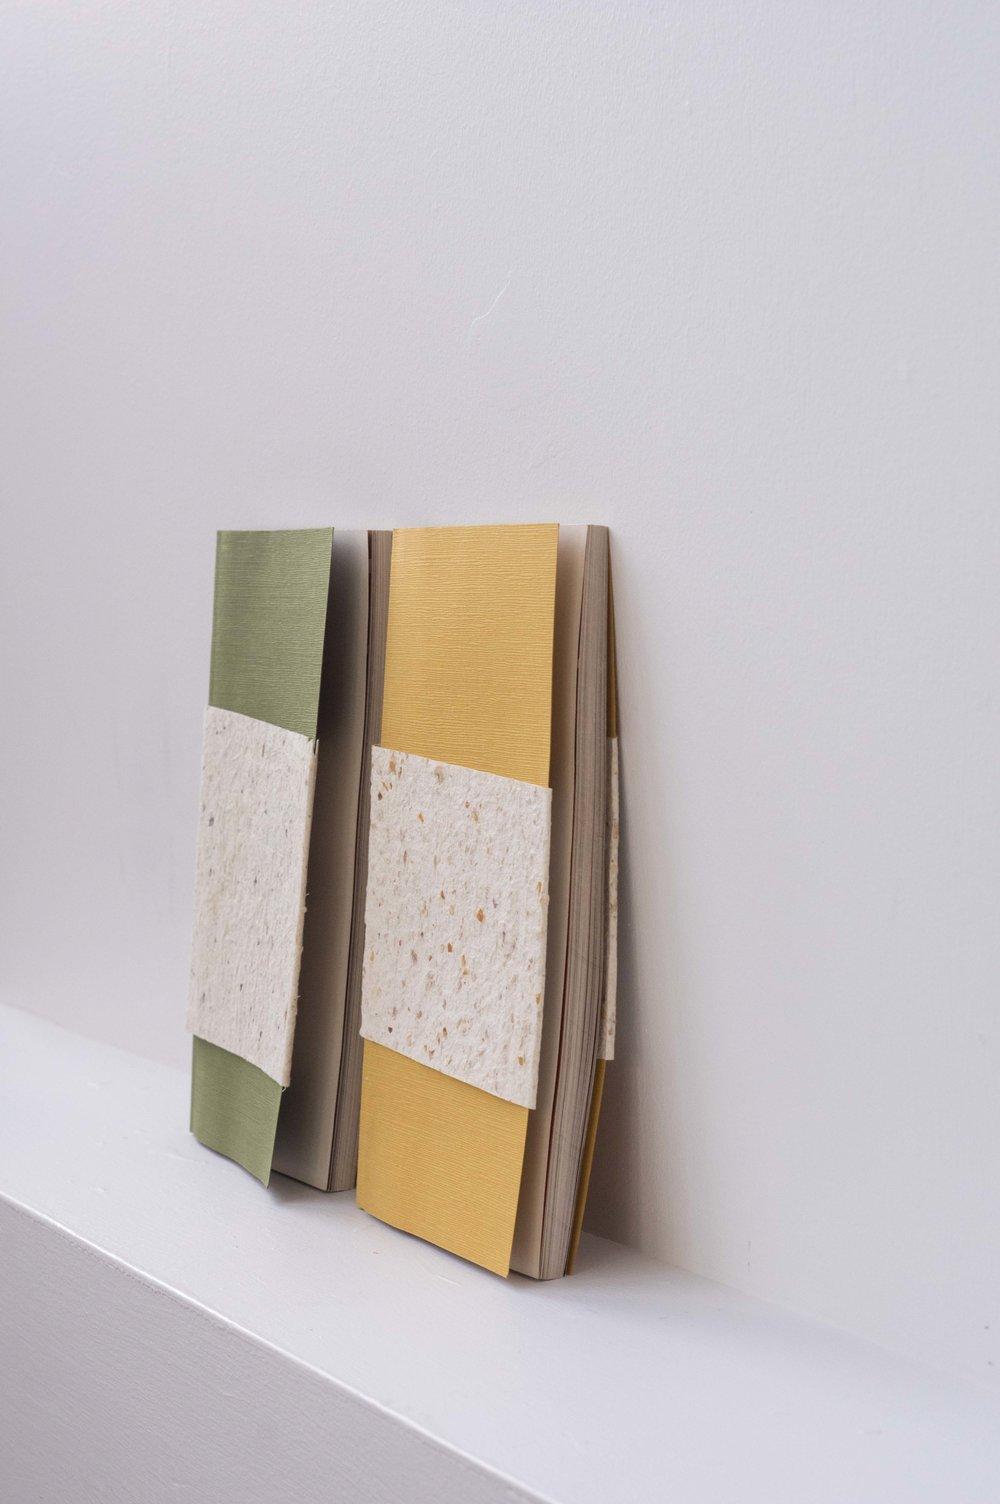 Tangents-PaperBooks-Web-5.jpg